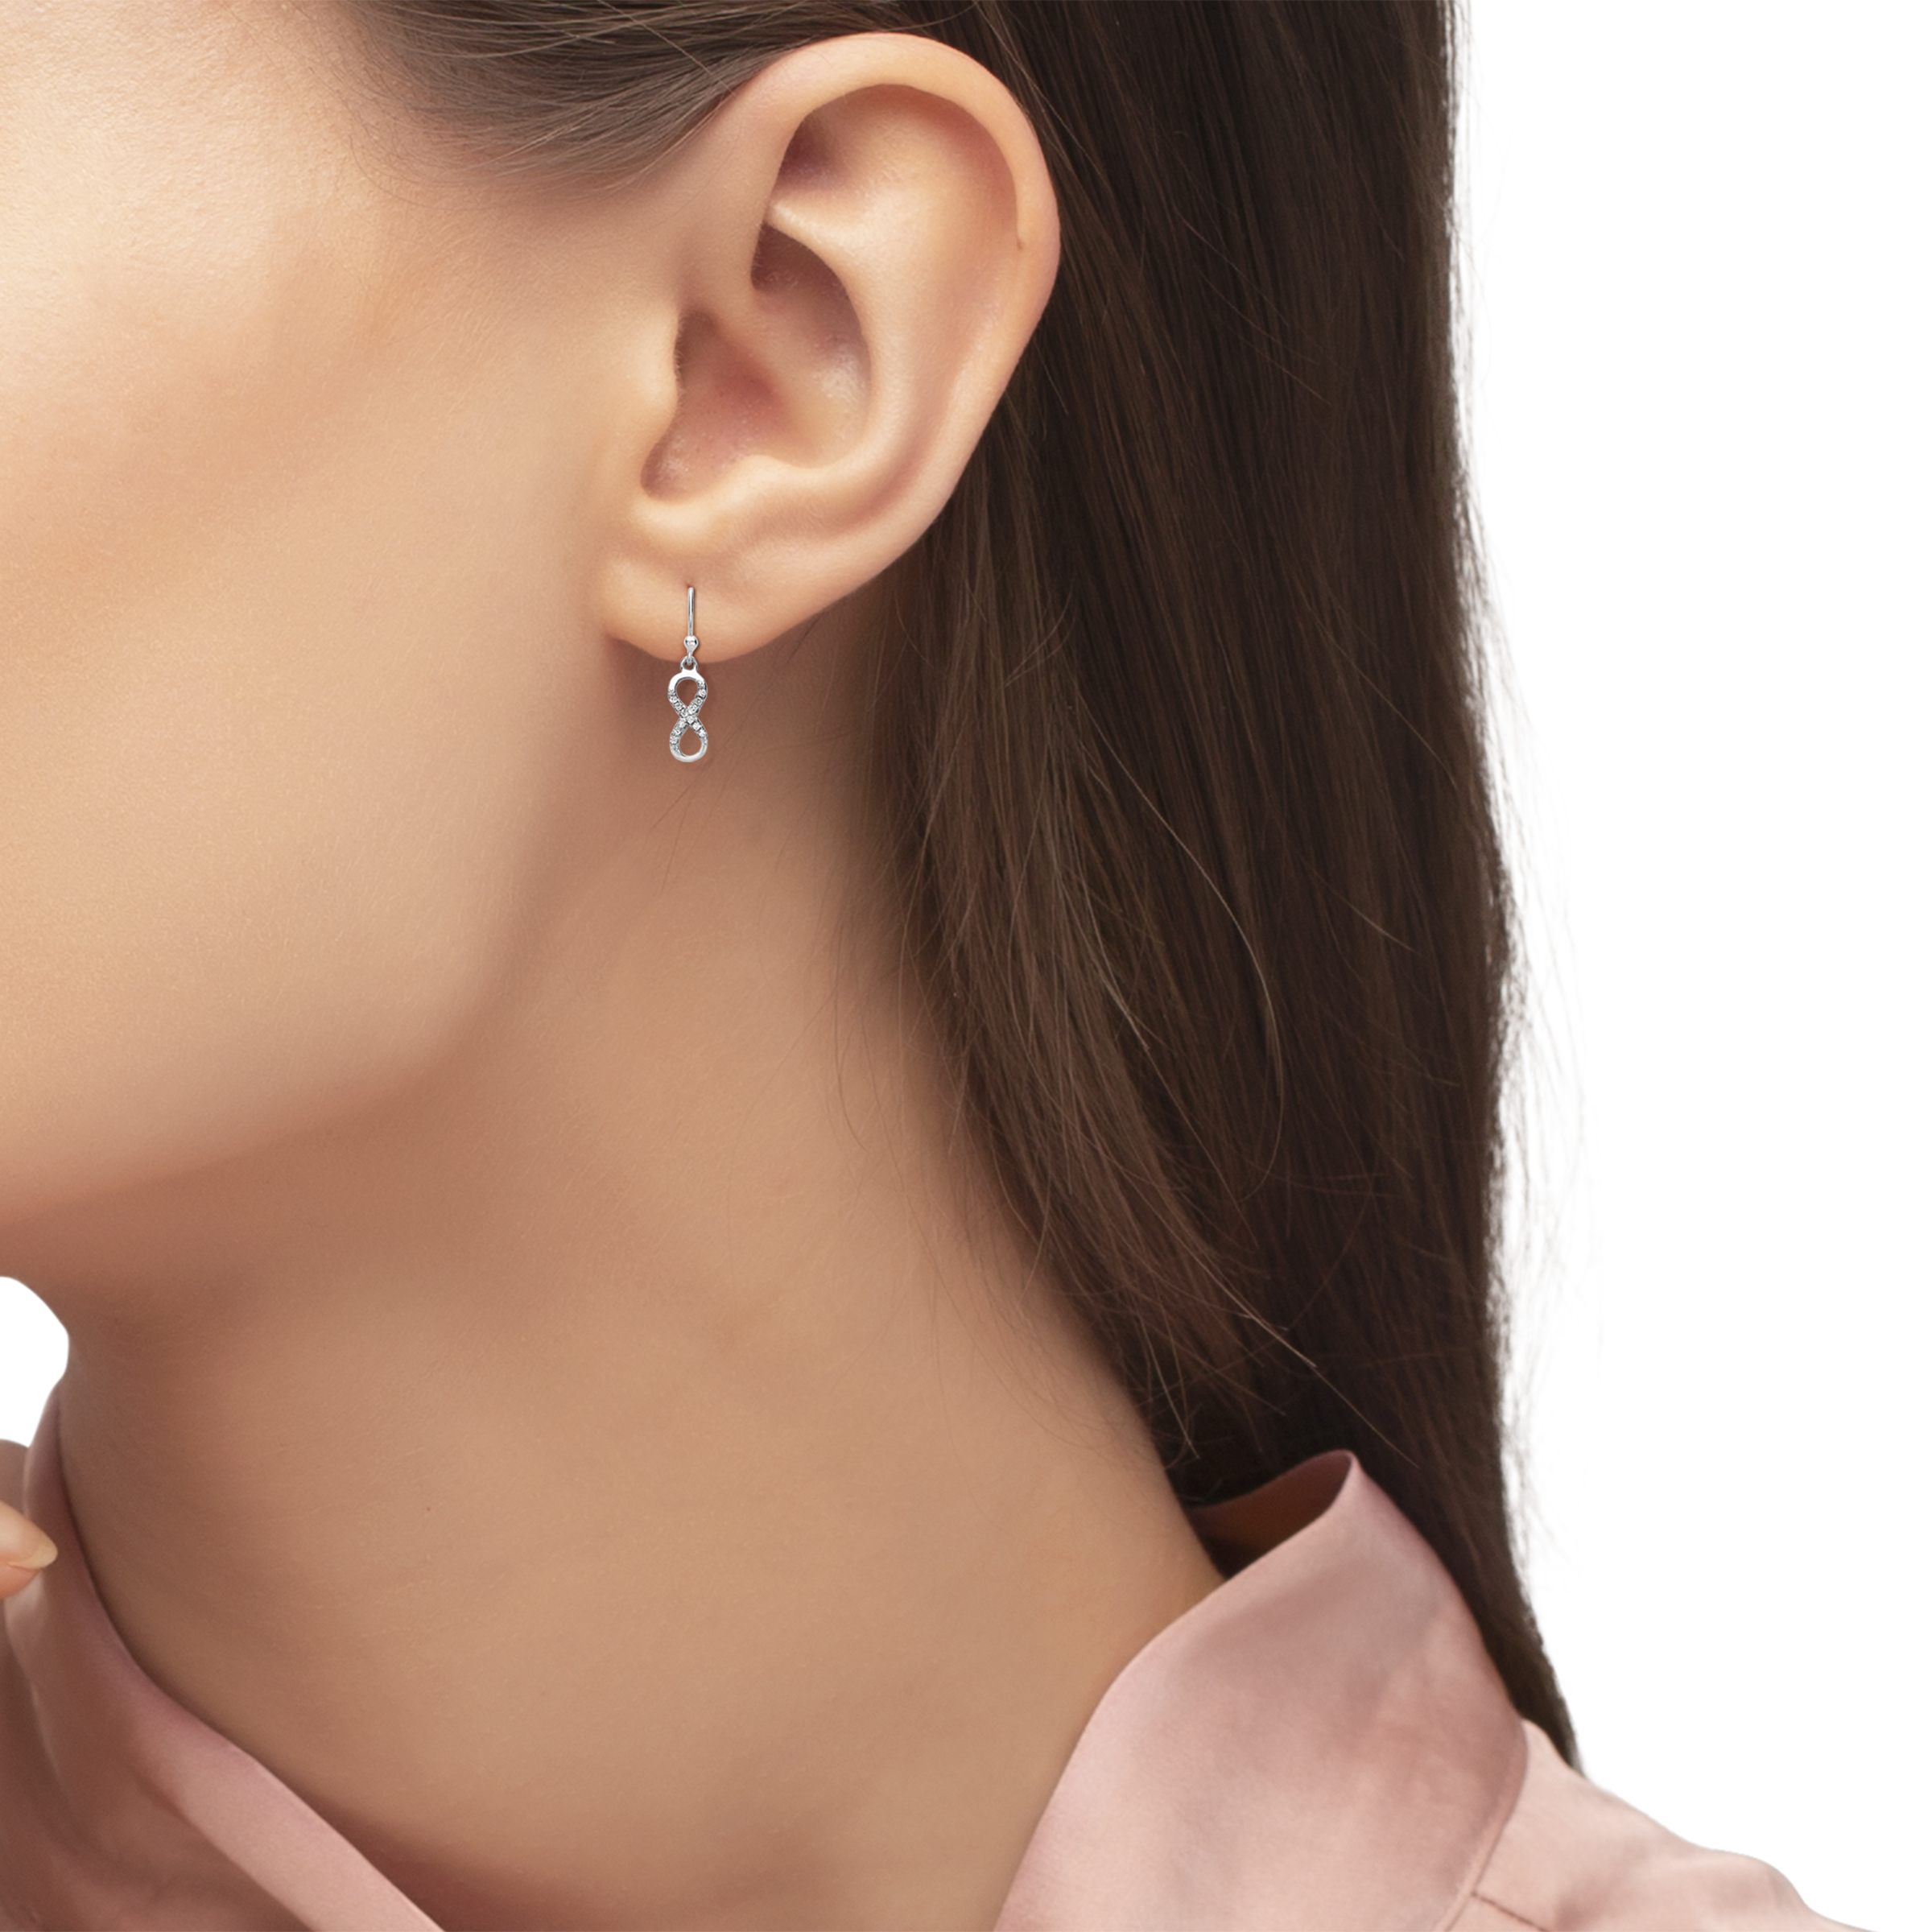 Ohrring für Damen, Sterling Silber 925, Zirkonia Infinity